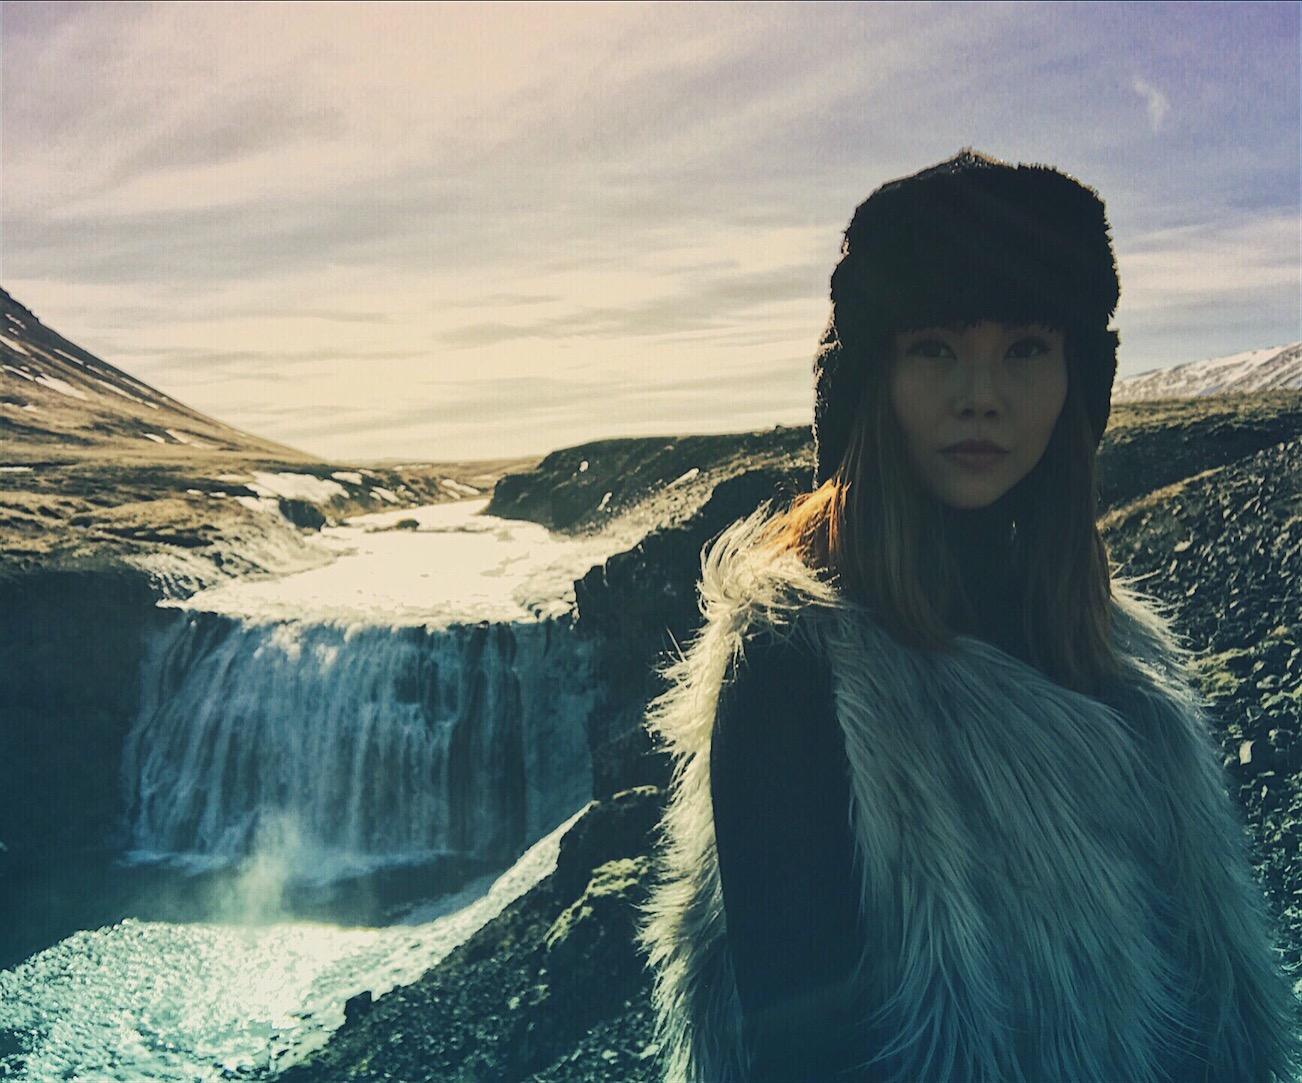 Bianca Valerio Porufoss Game of Thrones Iceland